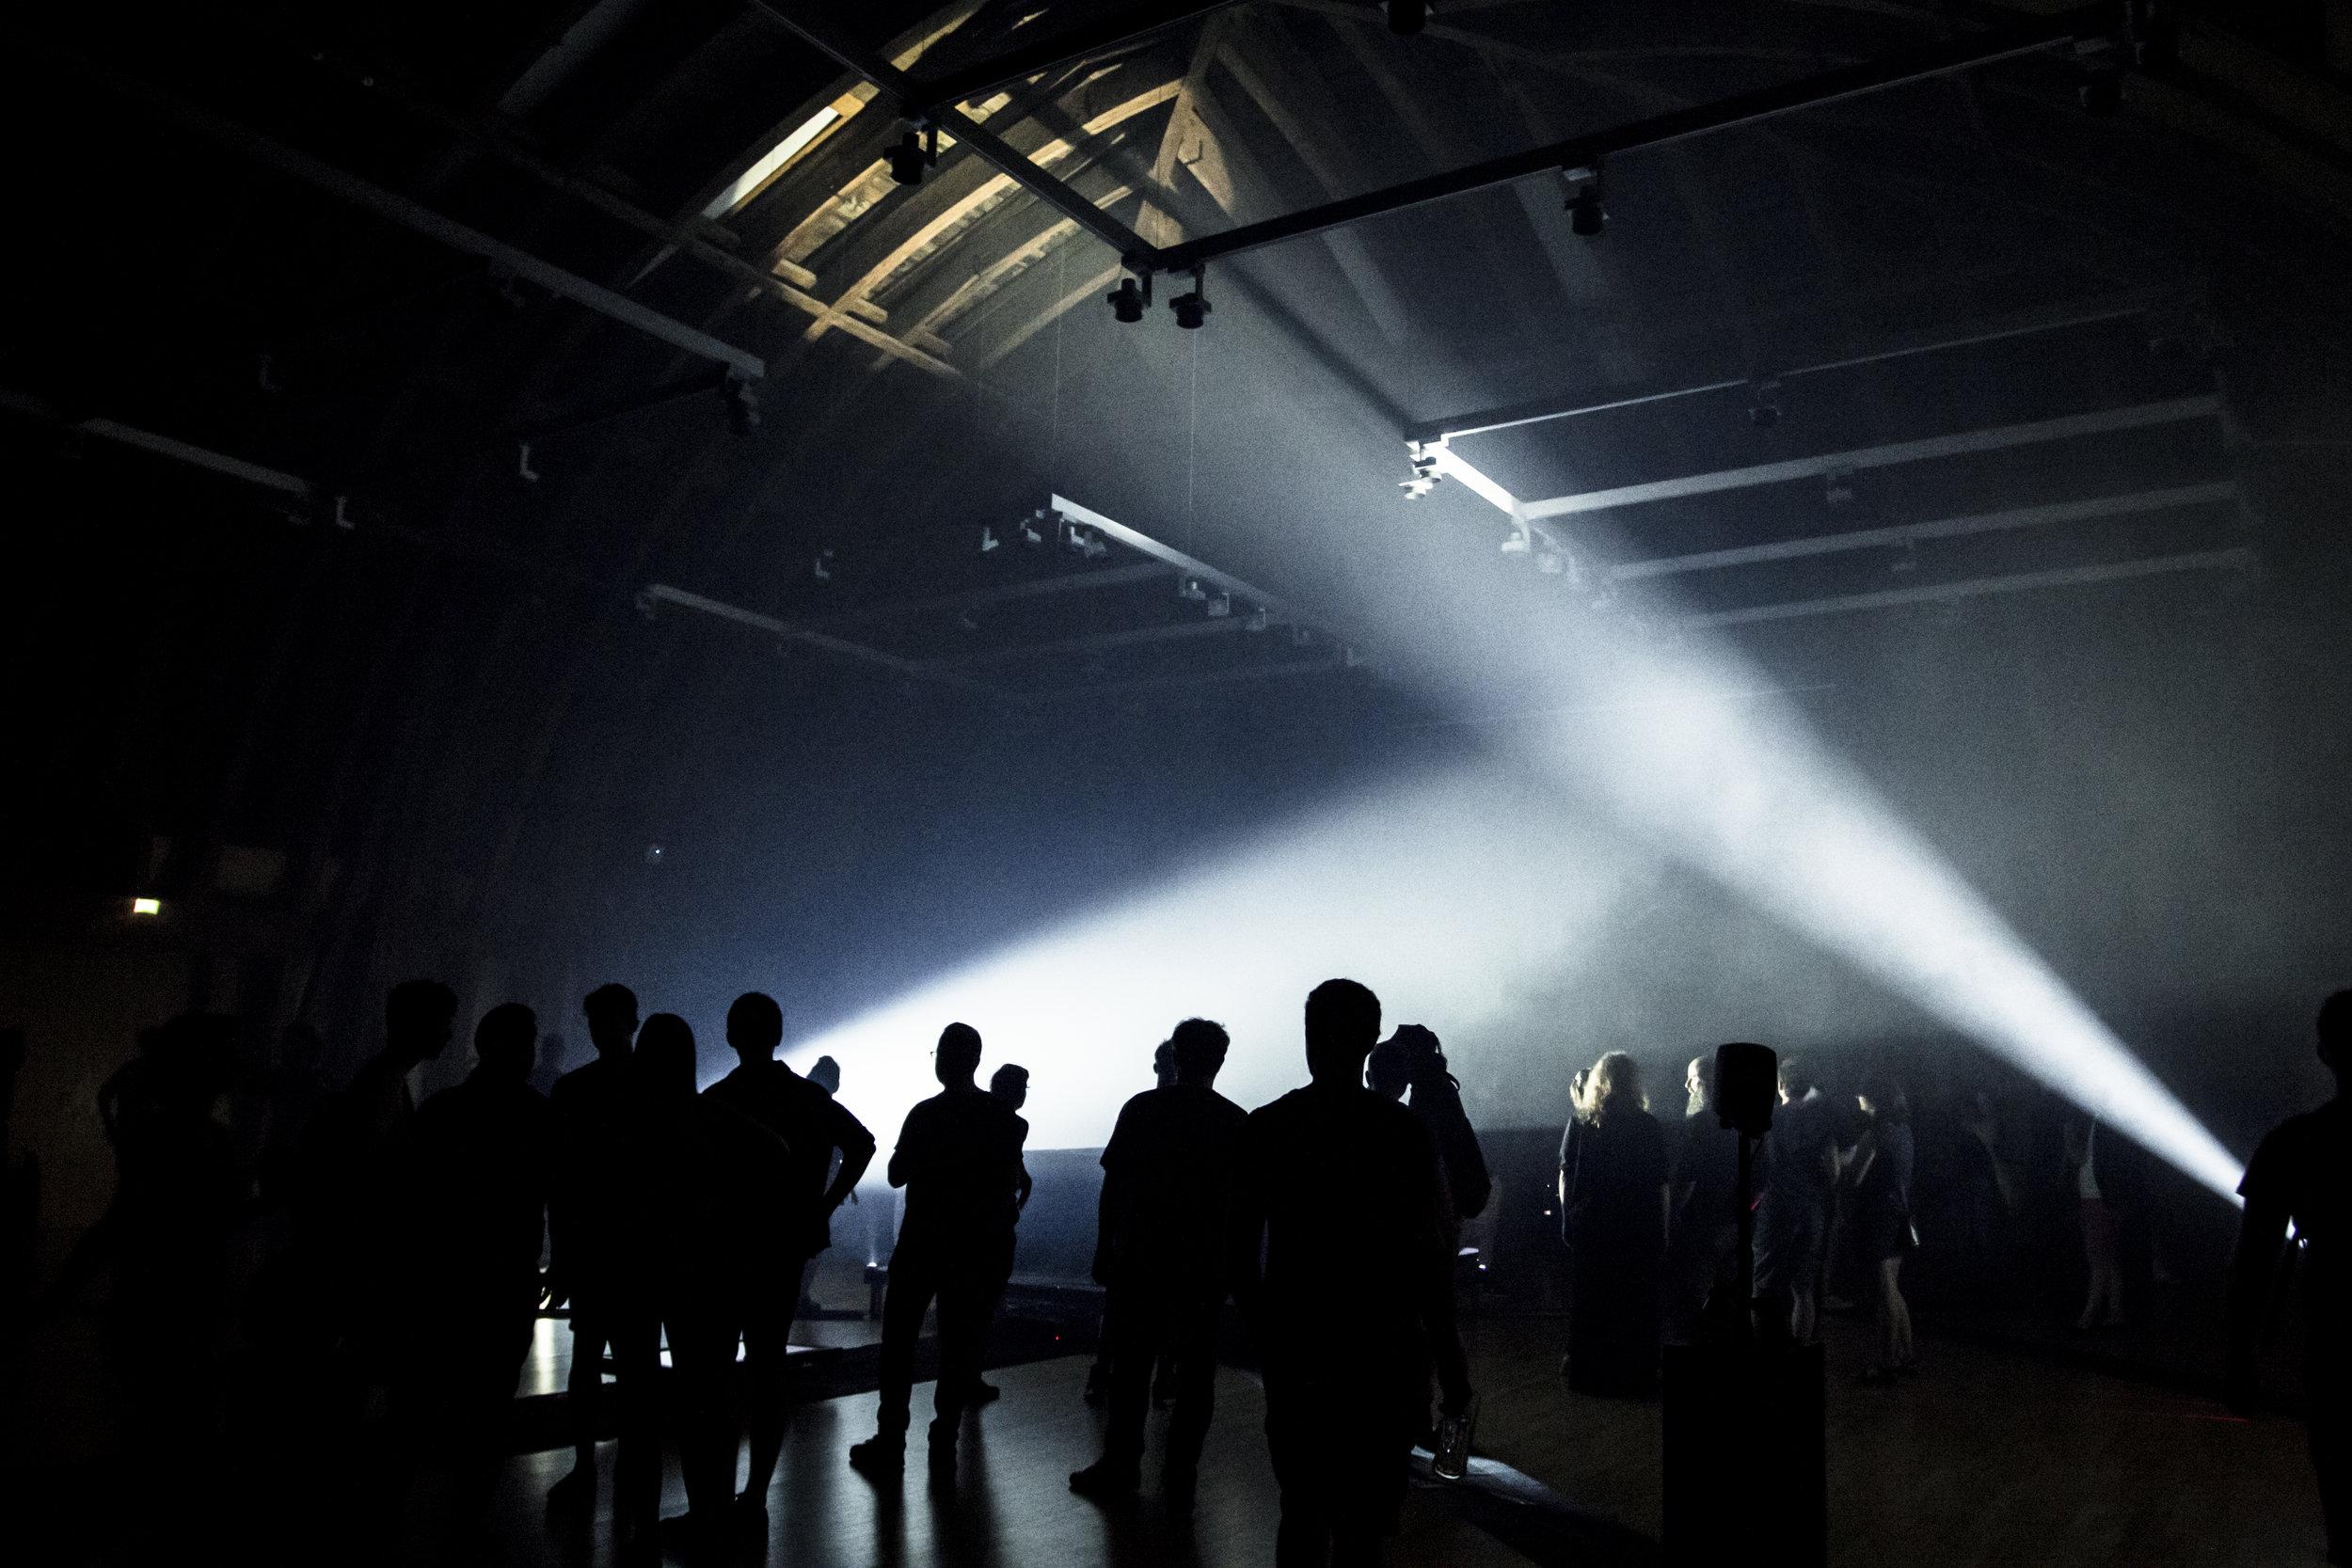 MUSIC AUDIENCE PARTICIPATION